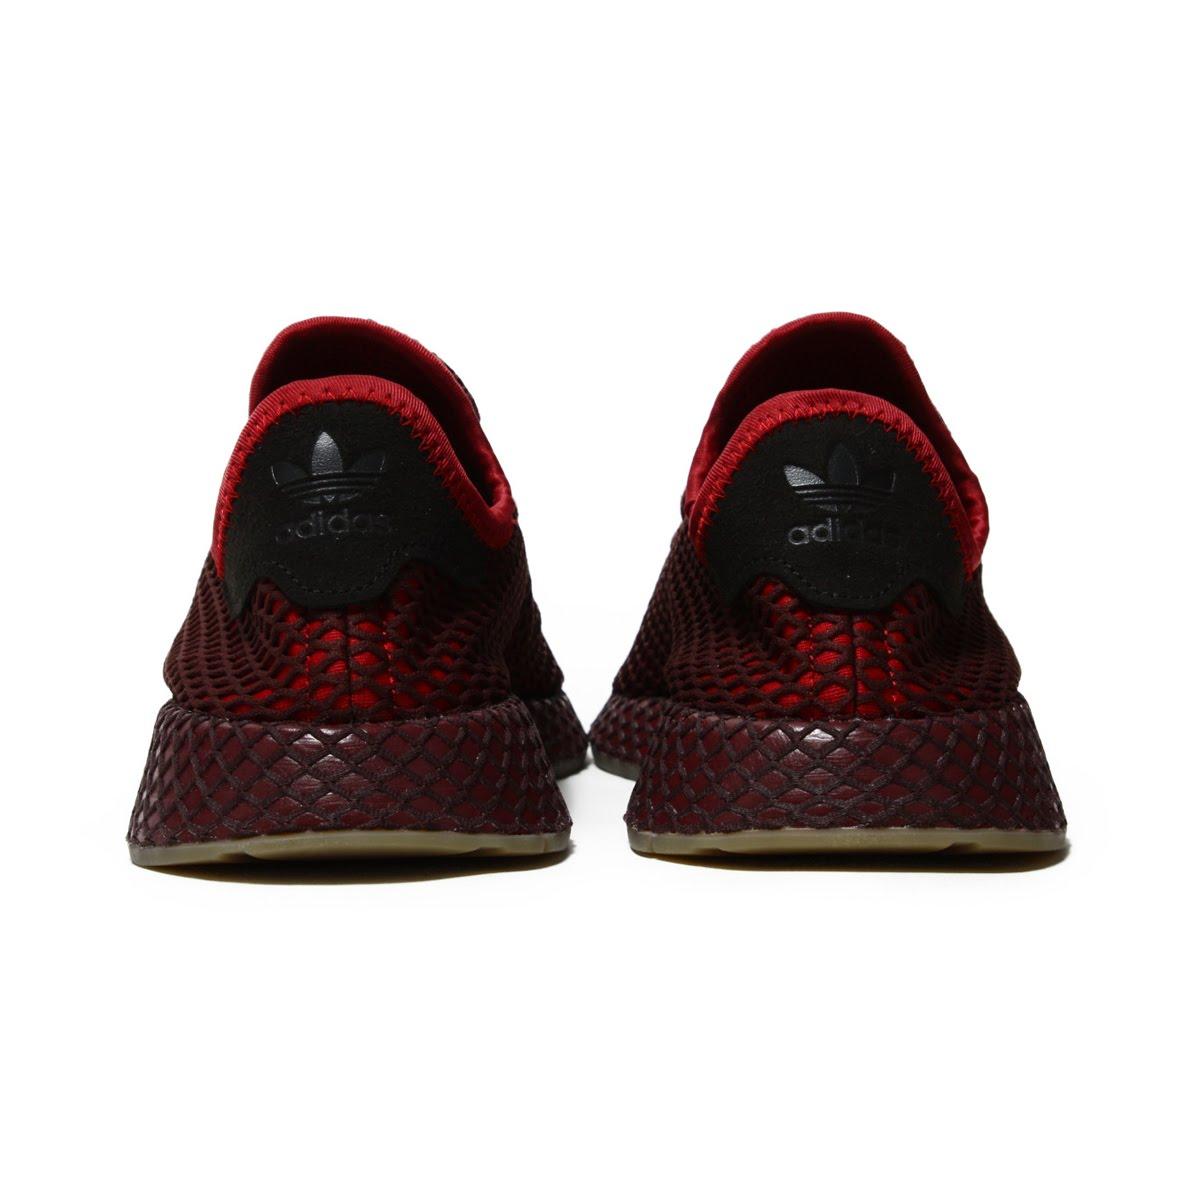 new product 3cf93 181f8 adidas Originals DEERUPT RUNNER (Adidas originals D - ラプトランナー) COLLEGEATE  BURGUNDYCOLLEGEATE BURGUNDYASH GREEN 18FW-I